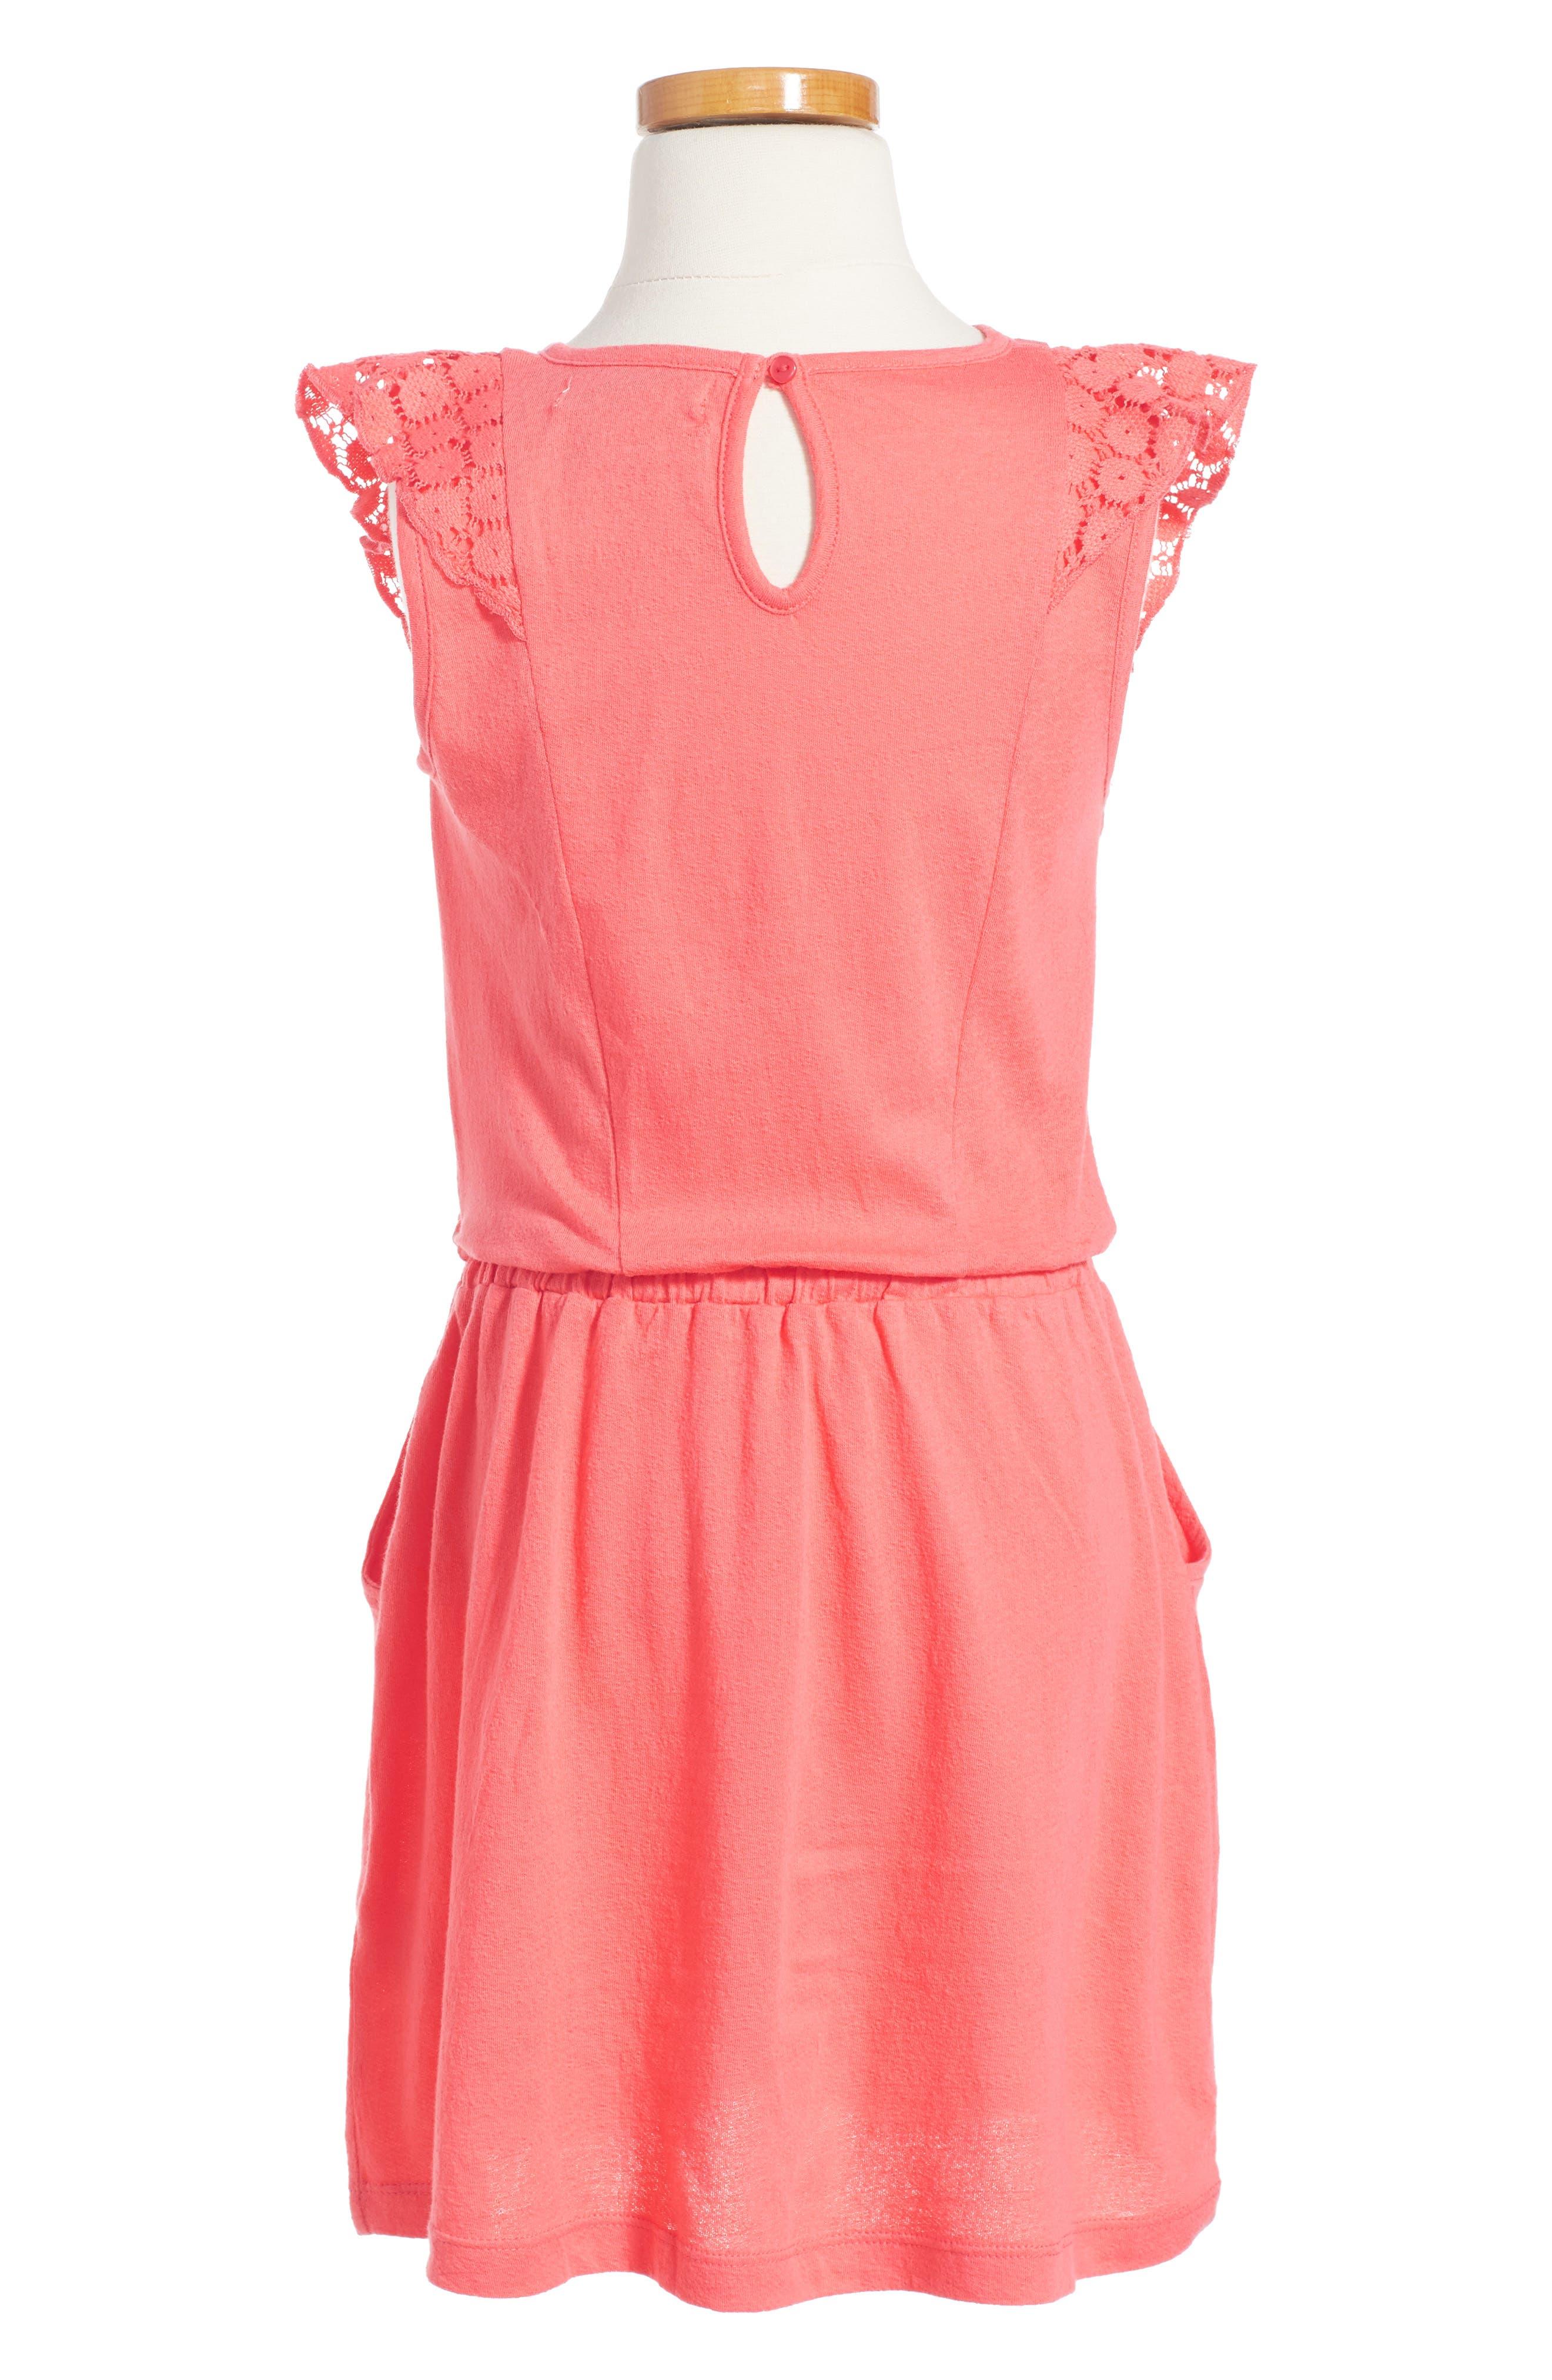 Ur Love Don't Mind Dress,                             Alternate thumbnail 2, color,